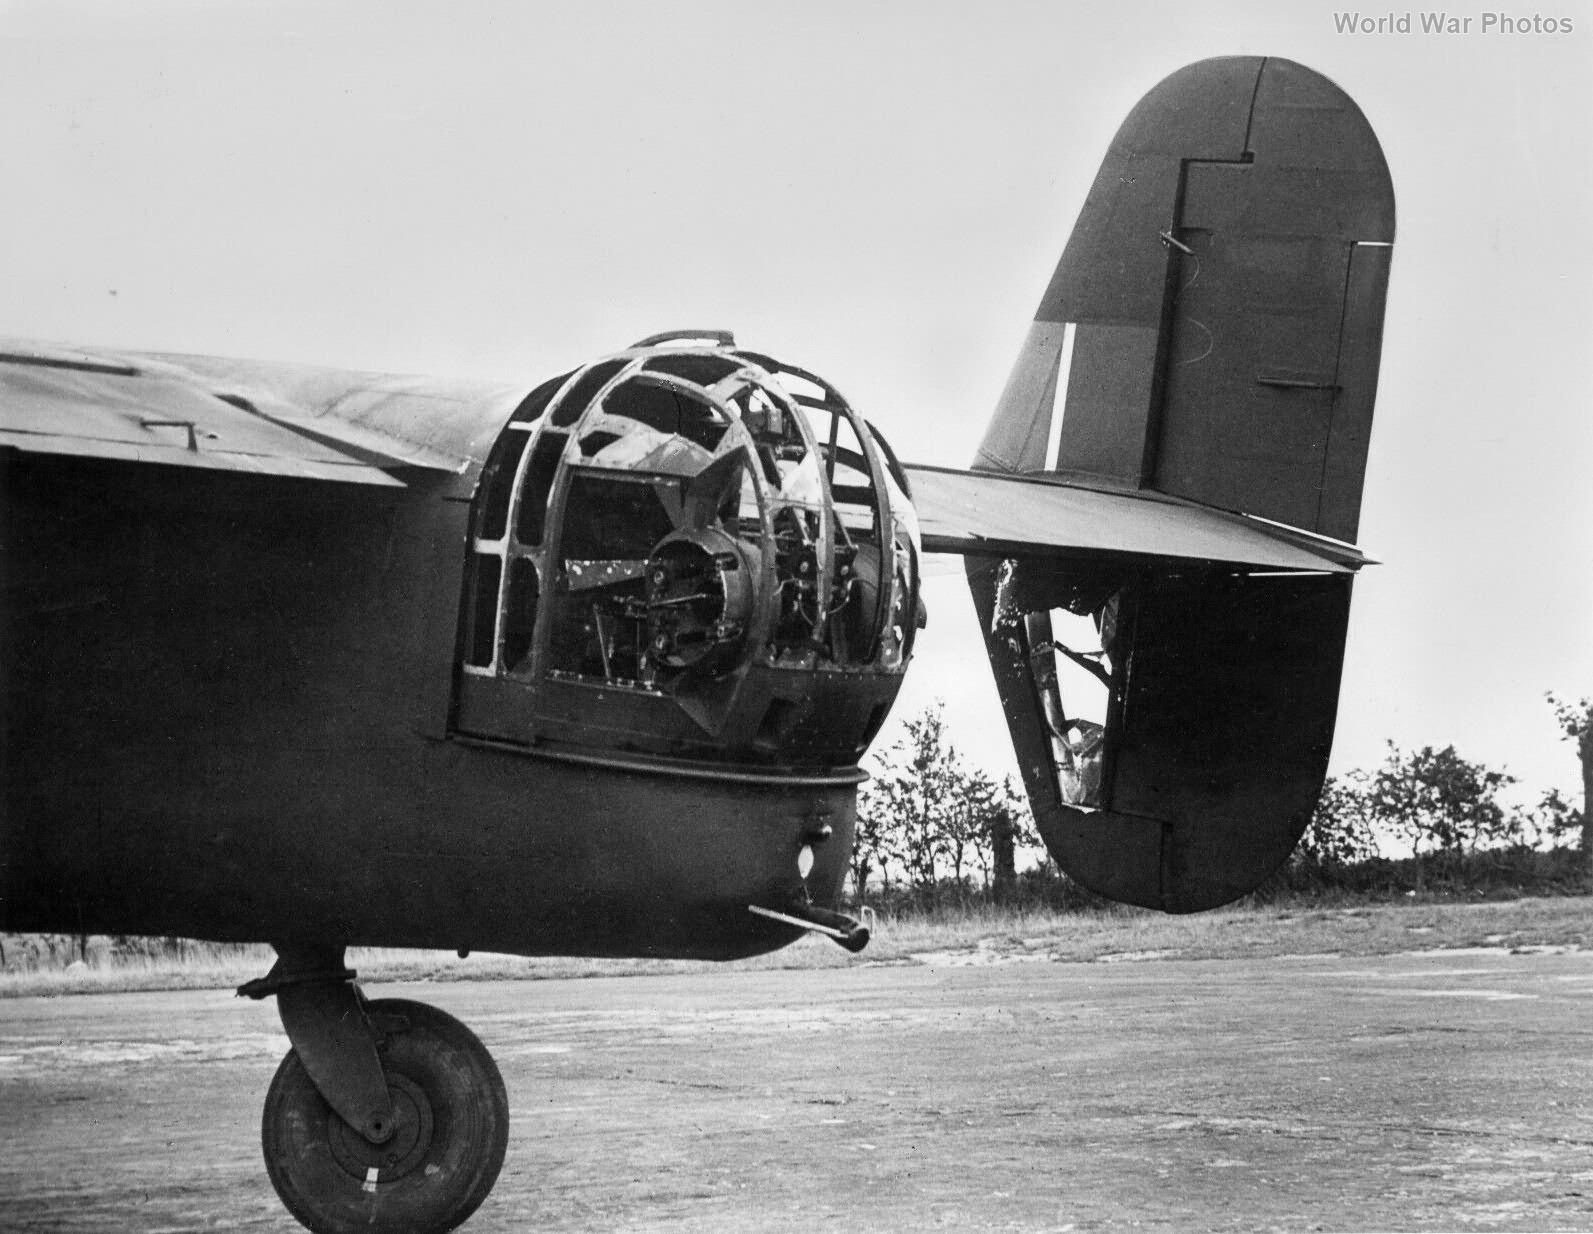 Halifax HR948 51 Sqn after attack on Berlin 23-24 Aug 43